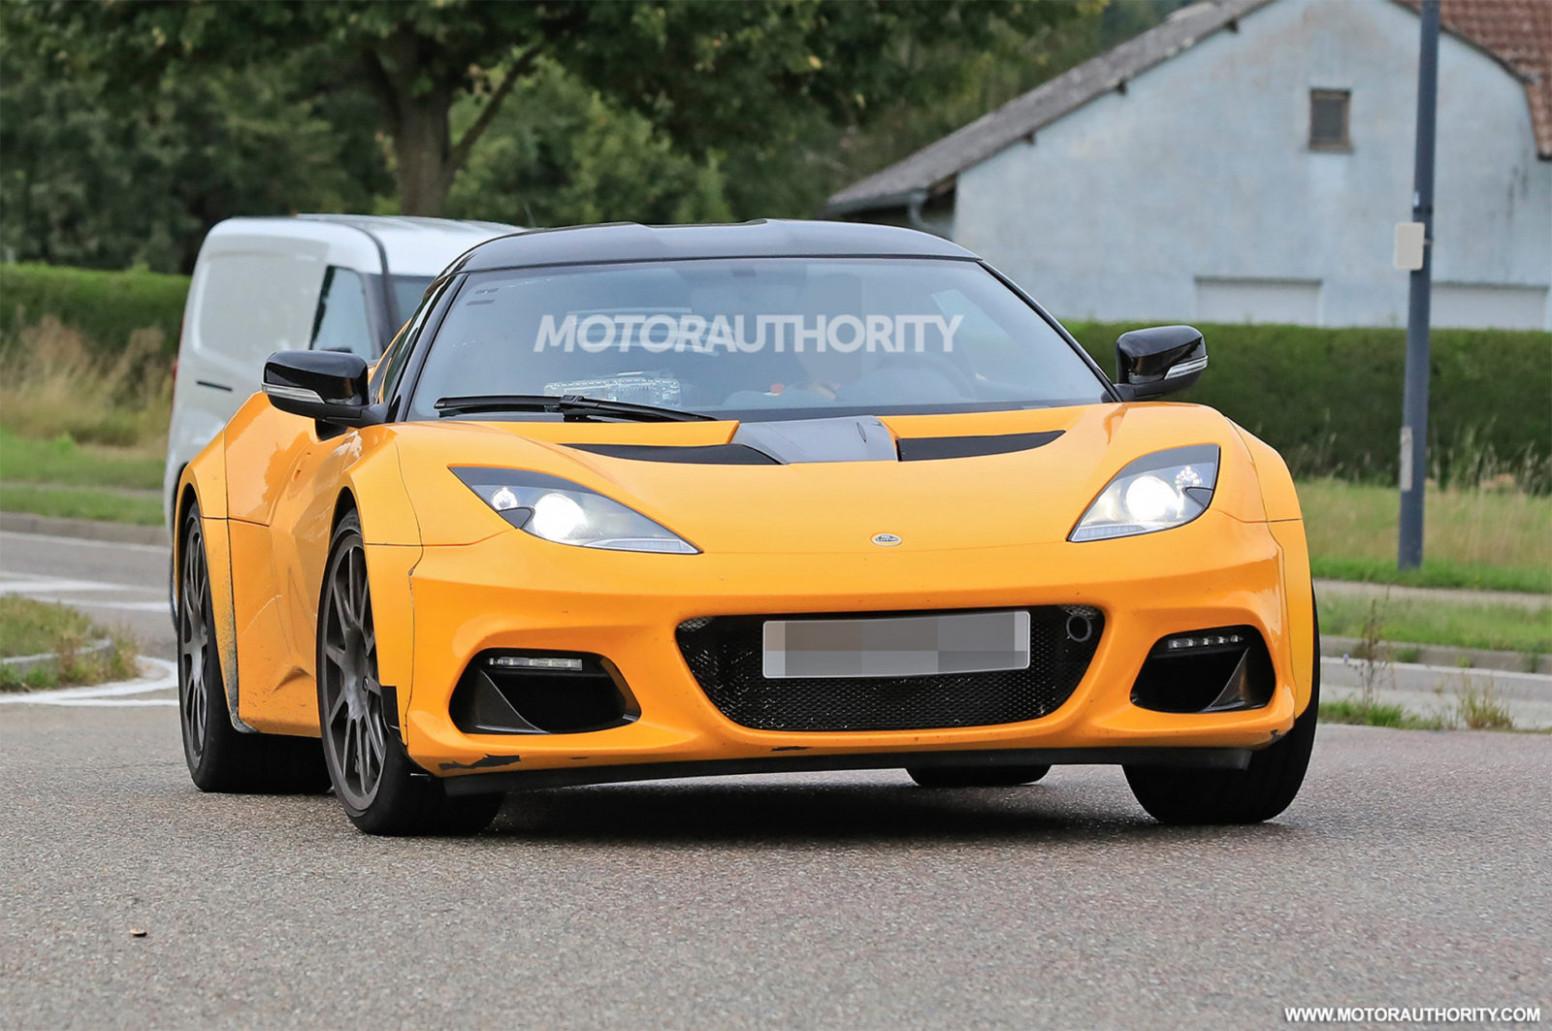 Performance and New Engine 2022 Lotus Evora